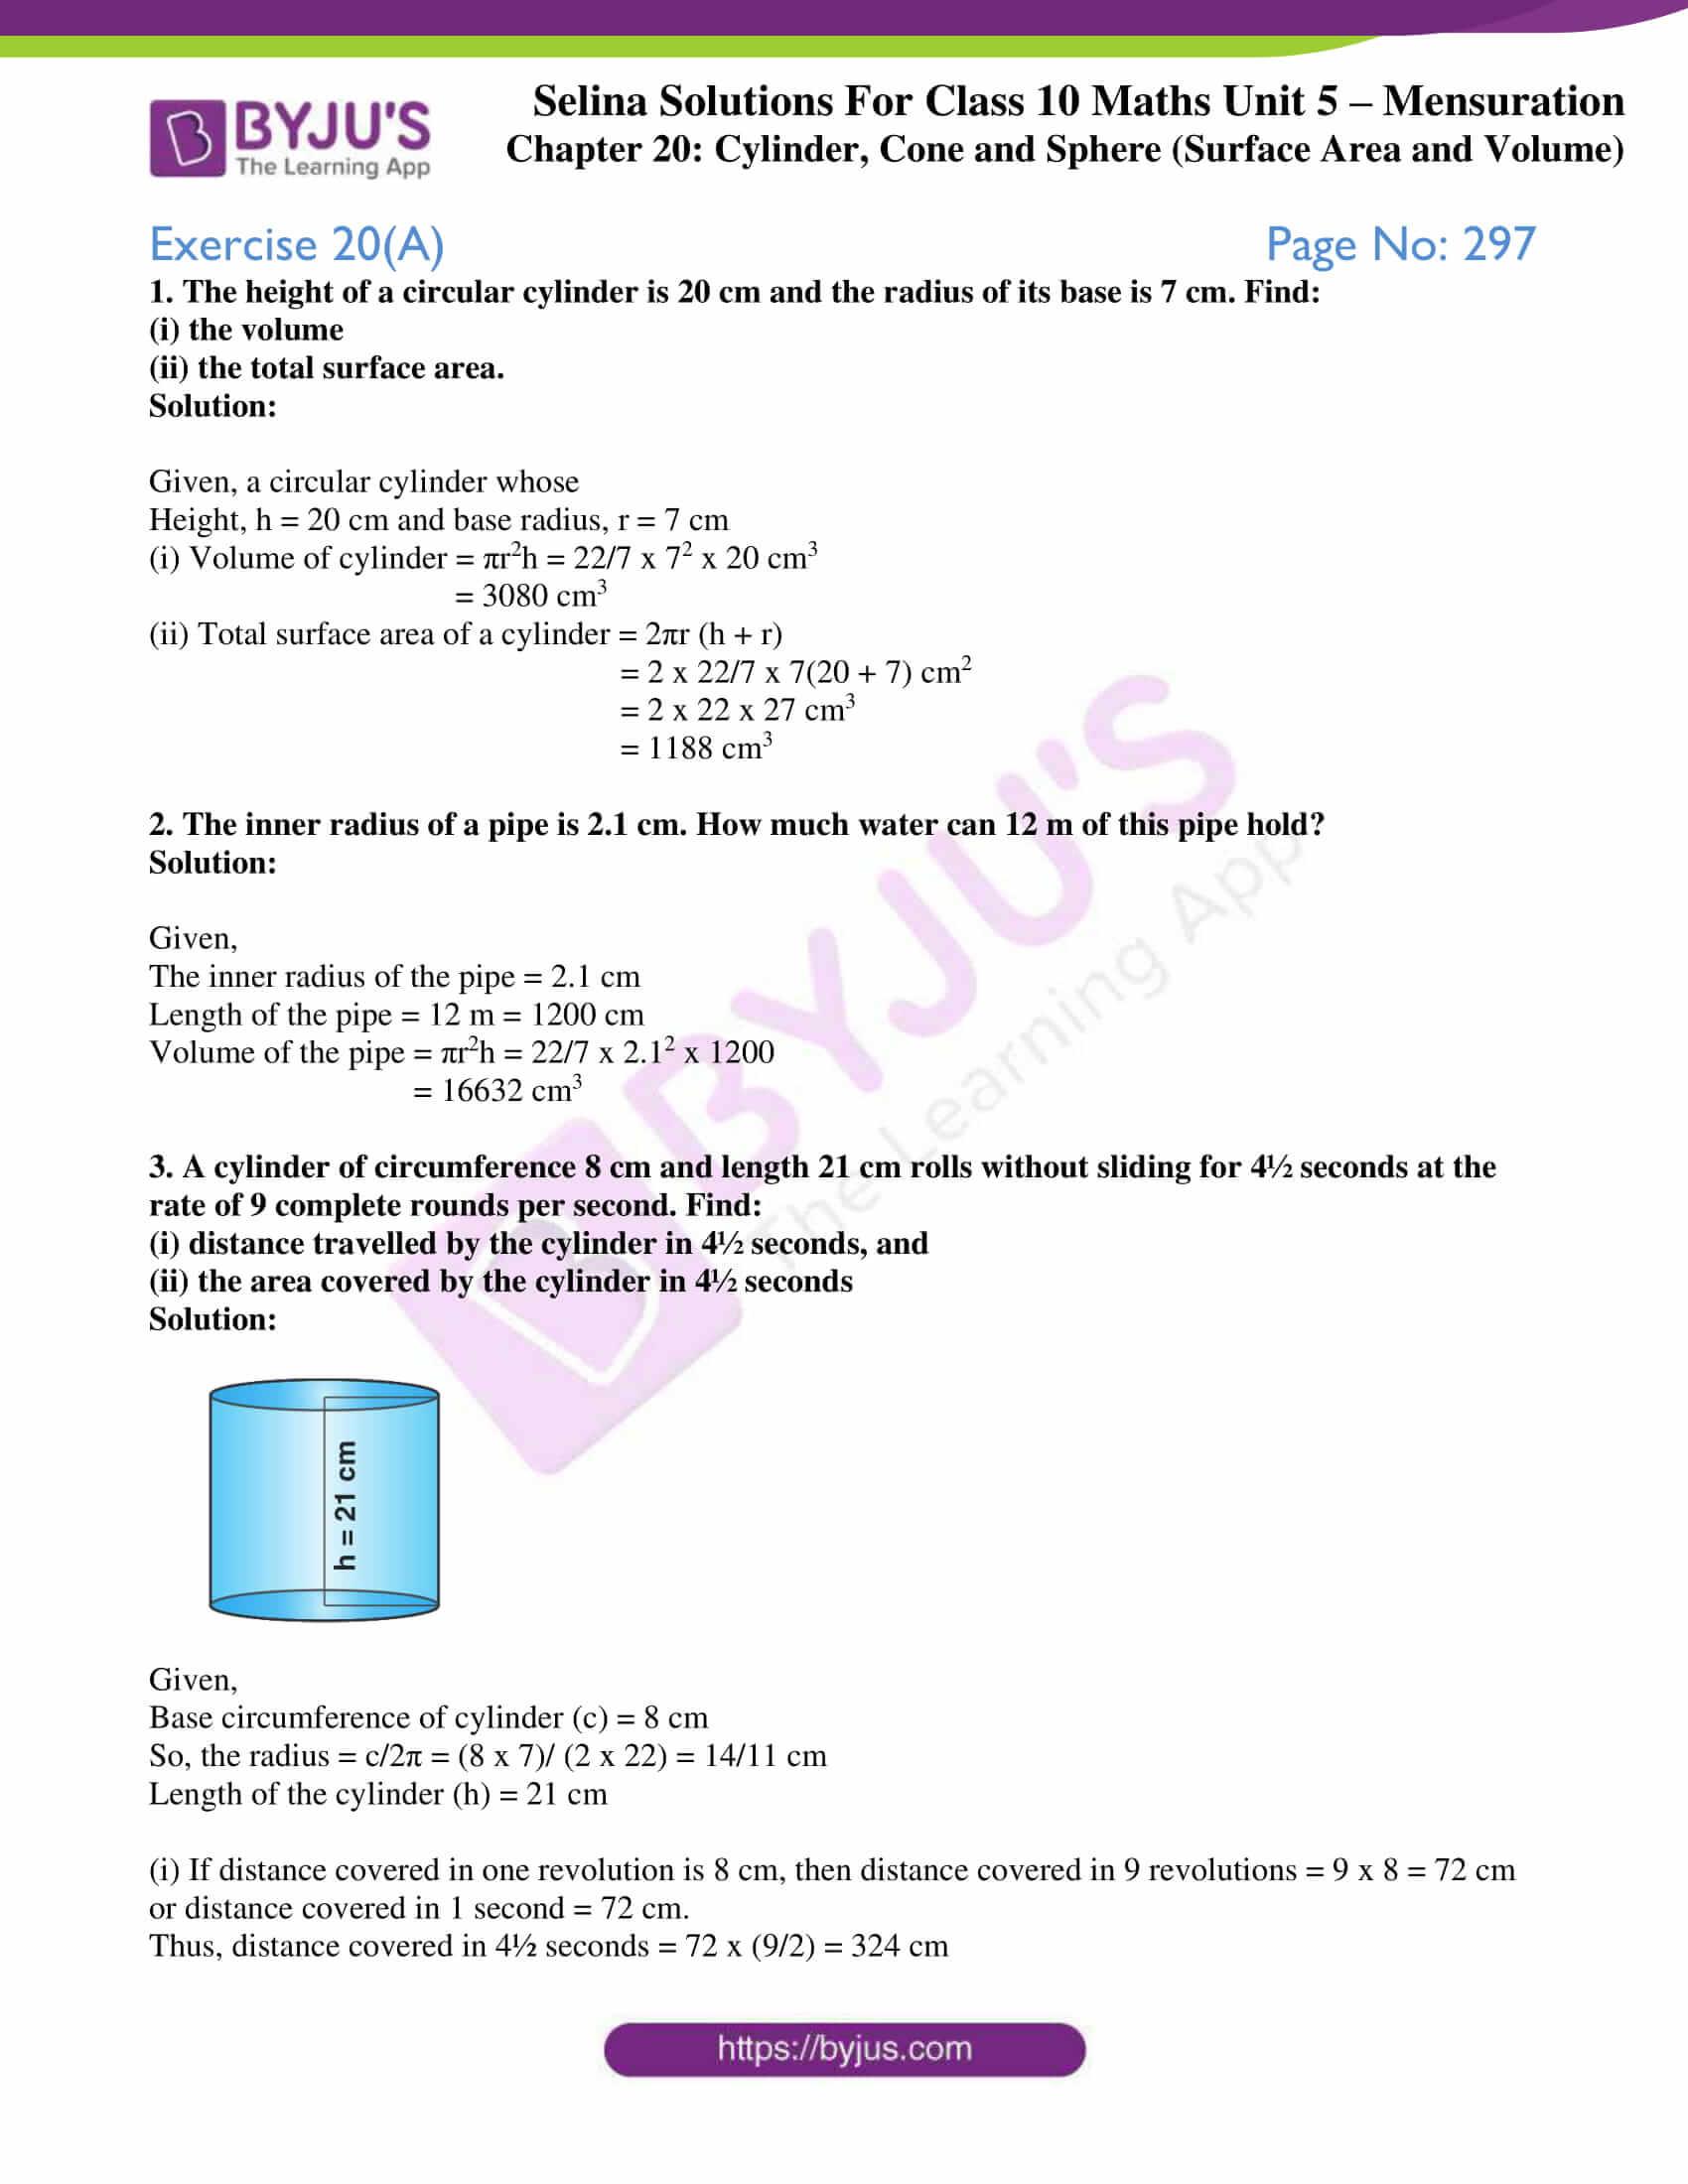 selina-sol-maths-class-10-ch-20-ex-a-1